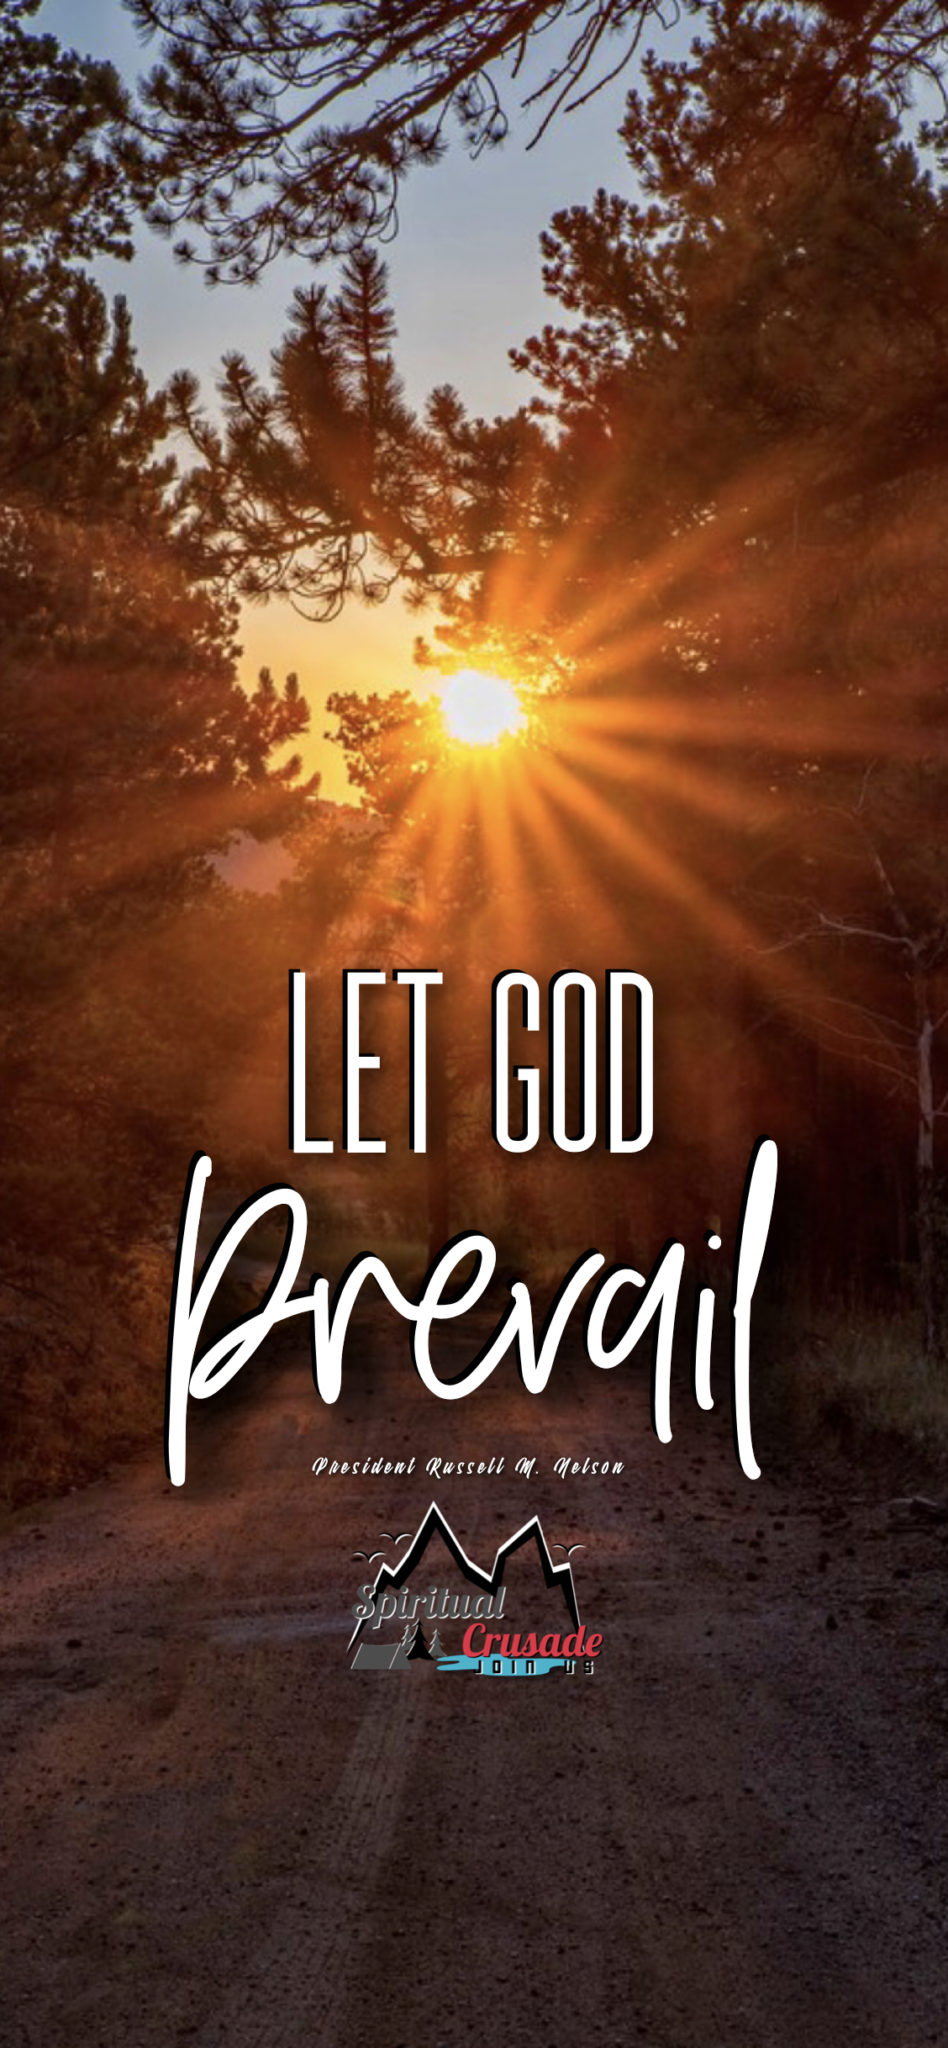 Let God Prevail | Spiritual Crusade